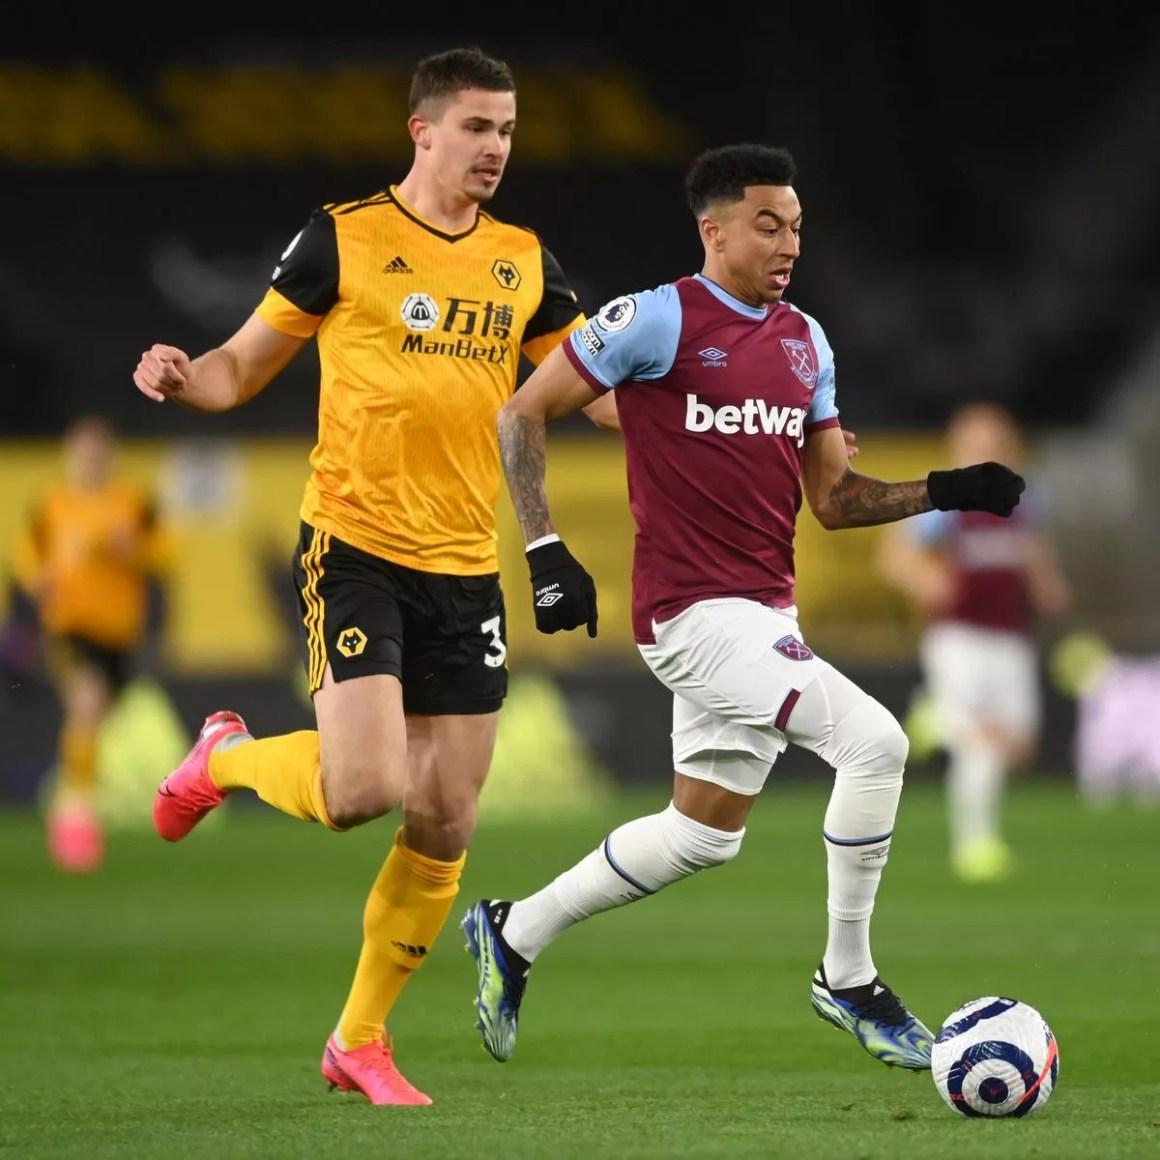 Gary Neville blasts Wolves' 'under-9s' defending against West Ham United -  Birmingham Live